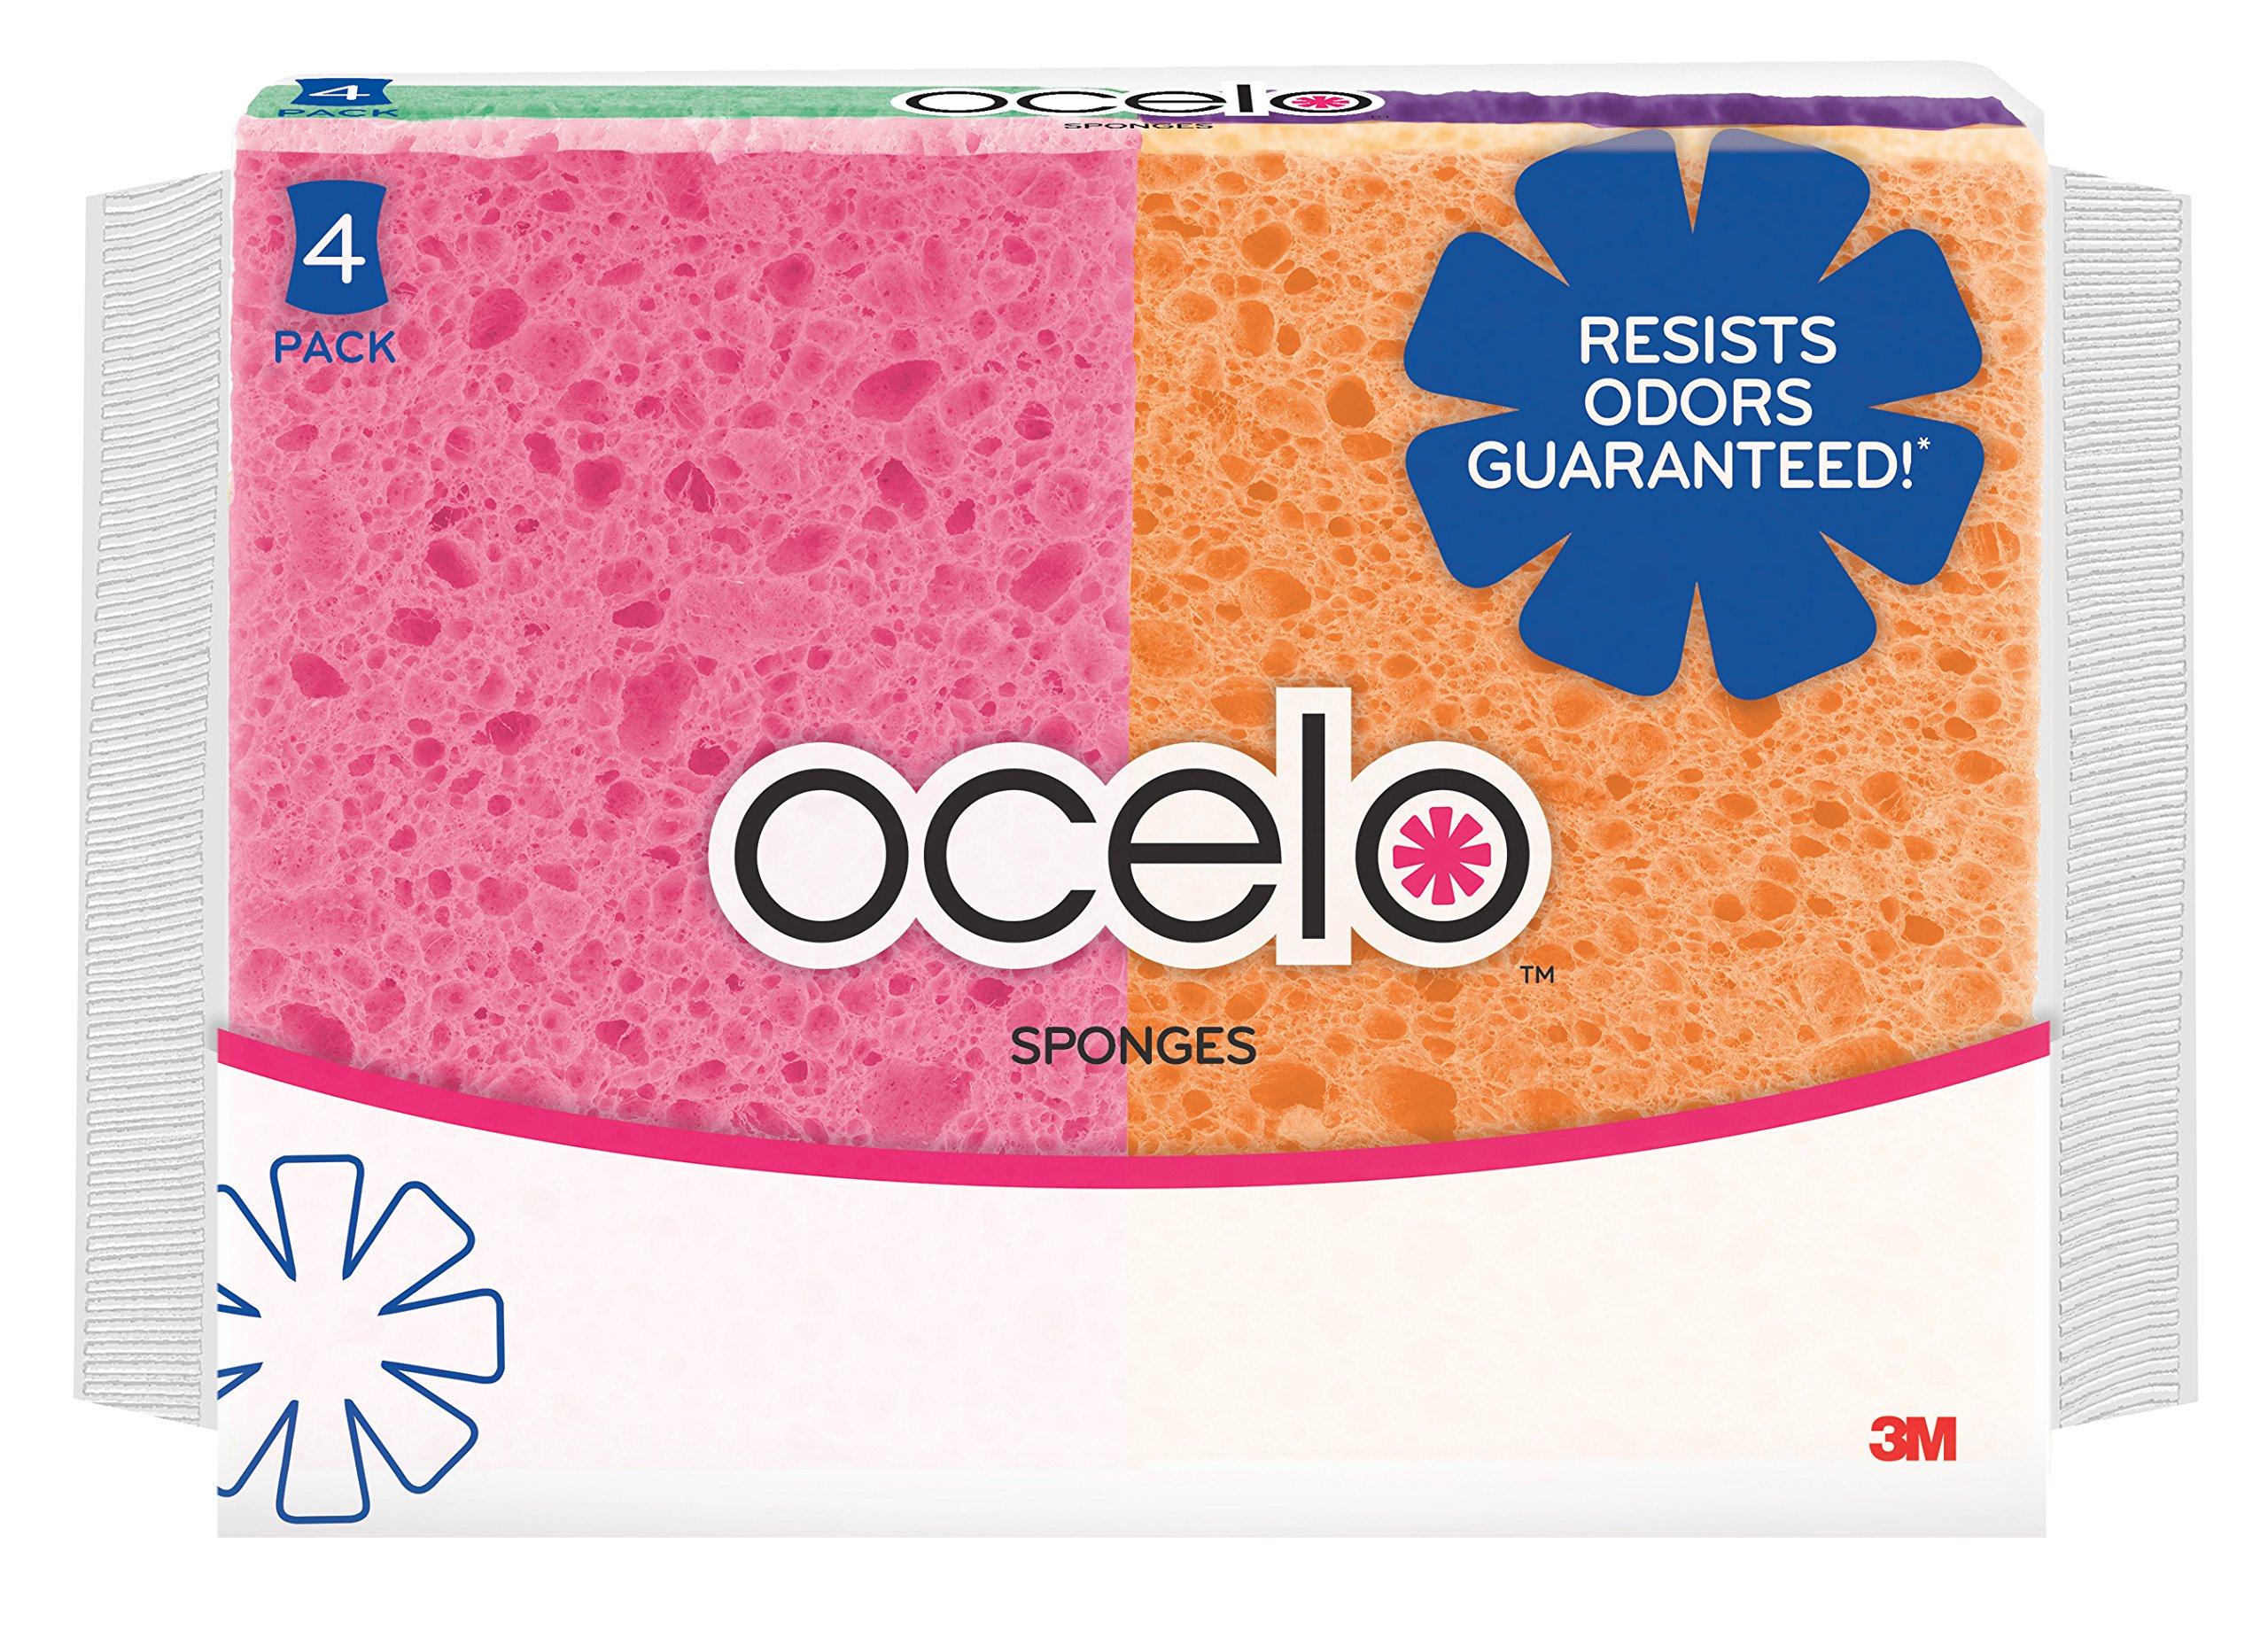 ocelo Cellulose Sponge, Colors may vary, 4-Sponges/Pk, 10-Packs, (40 Sponges Total)